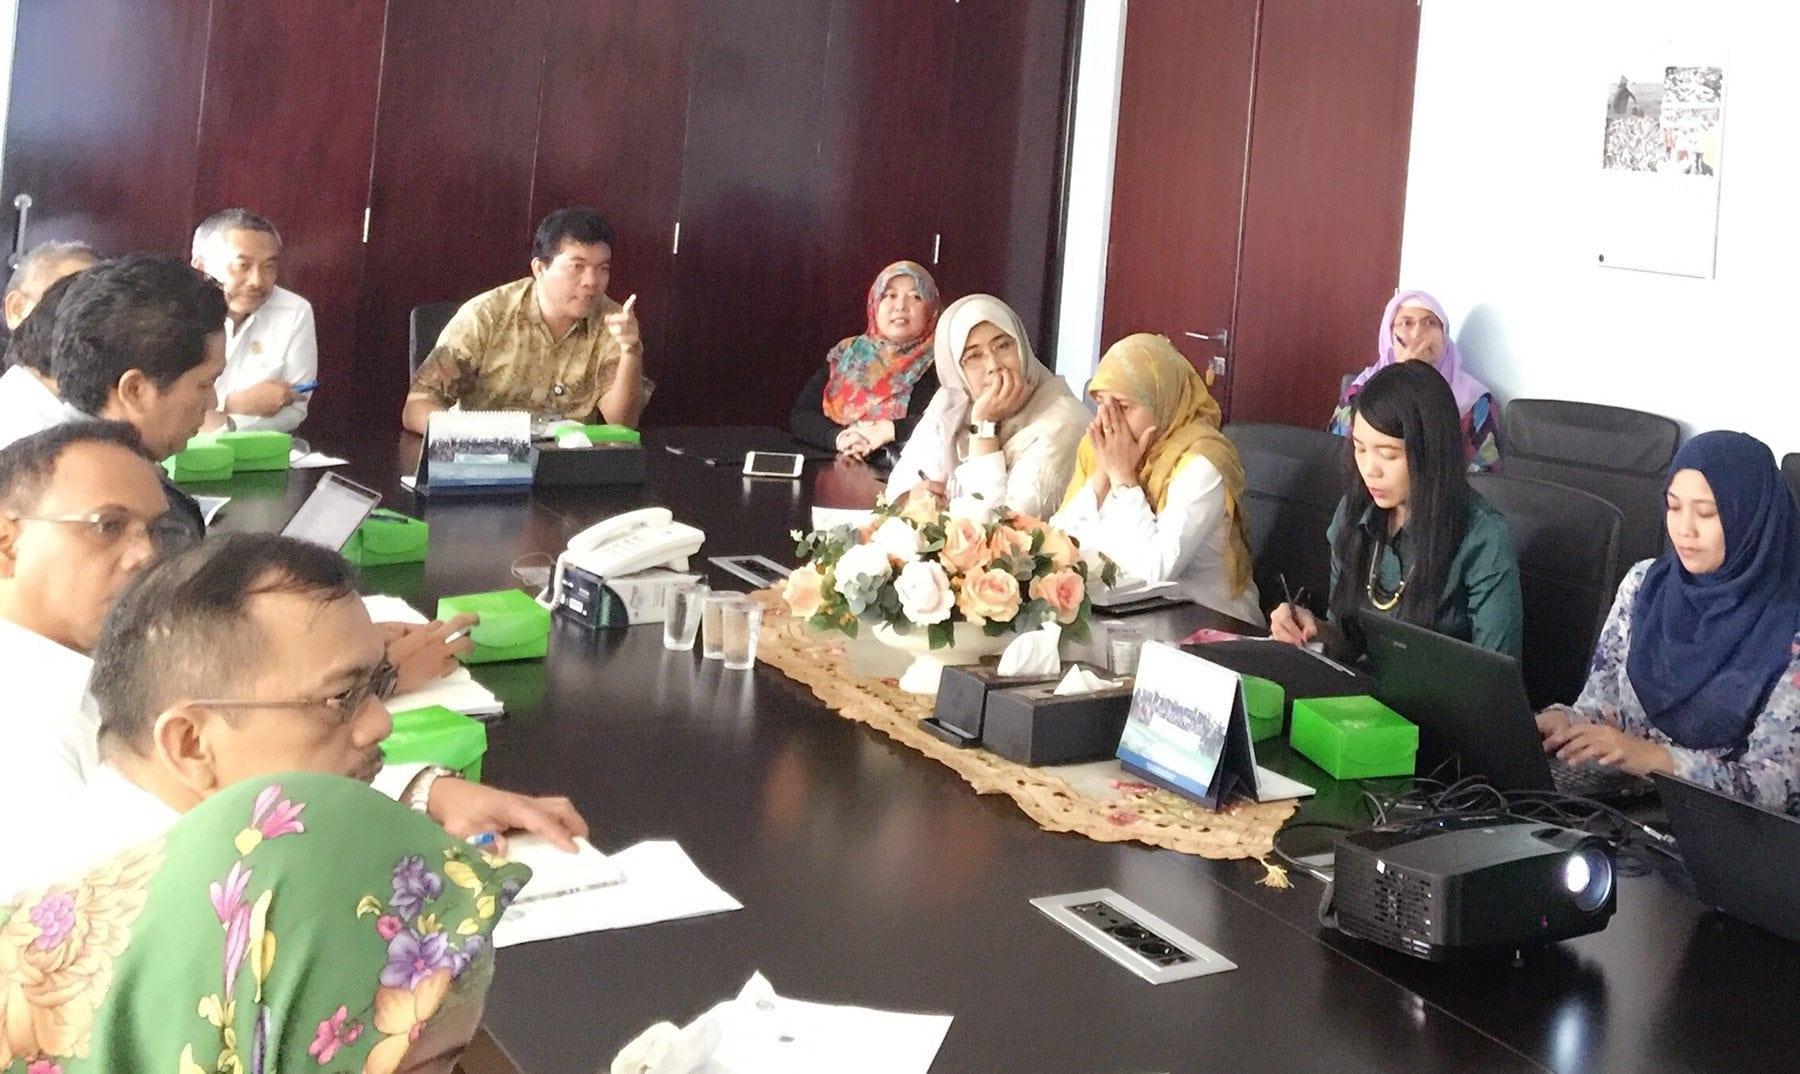 Pemerintah Lakukan Uji Fingerprint Terkait Pencemaran Minyak di Pantai Nongsa, Batam